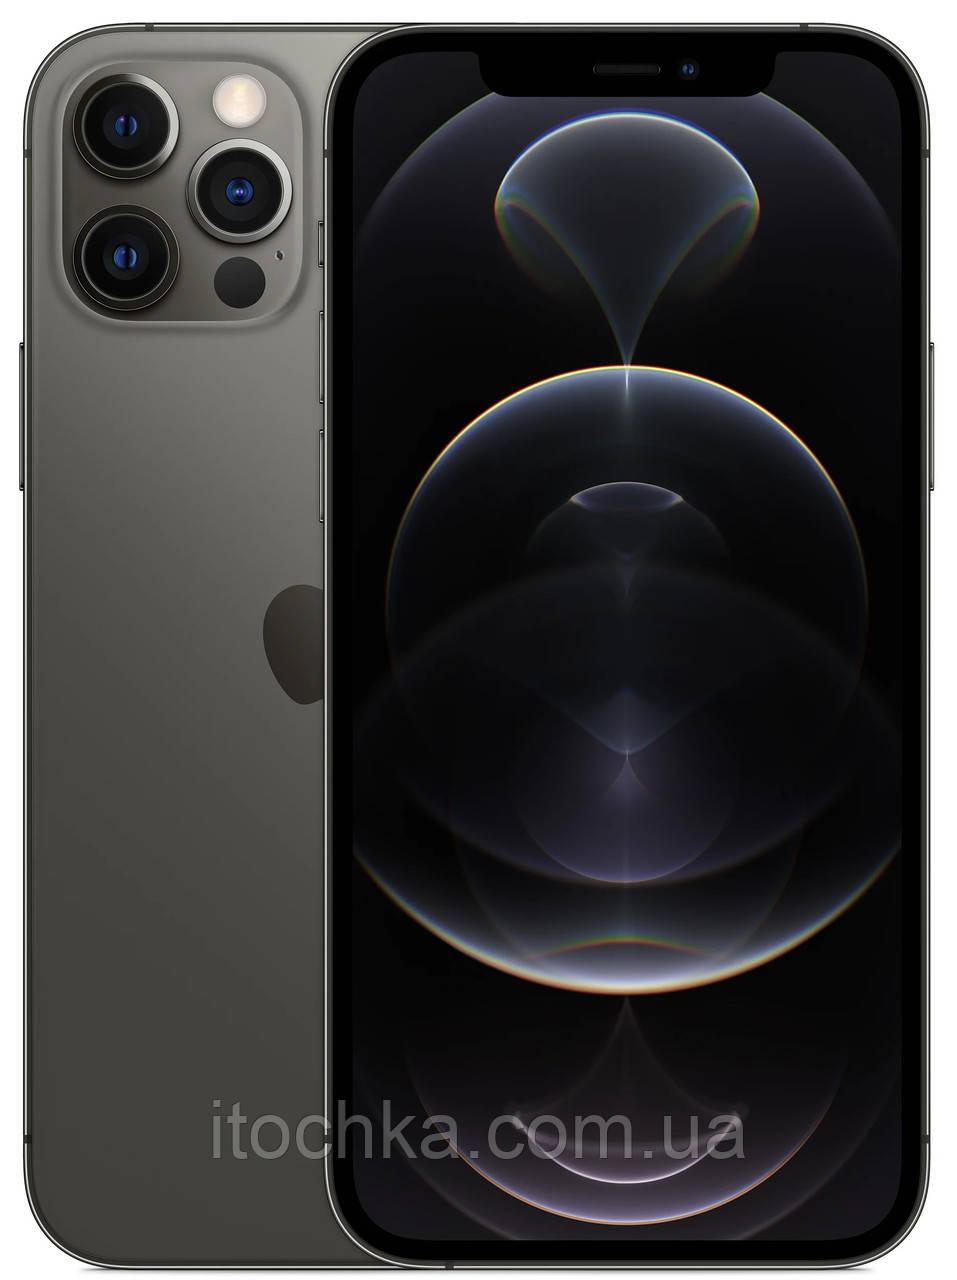 Apple iPhone 12 Pro 256GB Graphite (MGMP3)